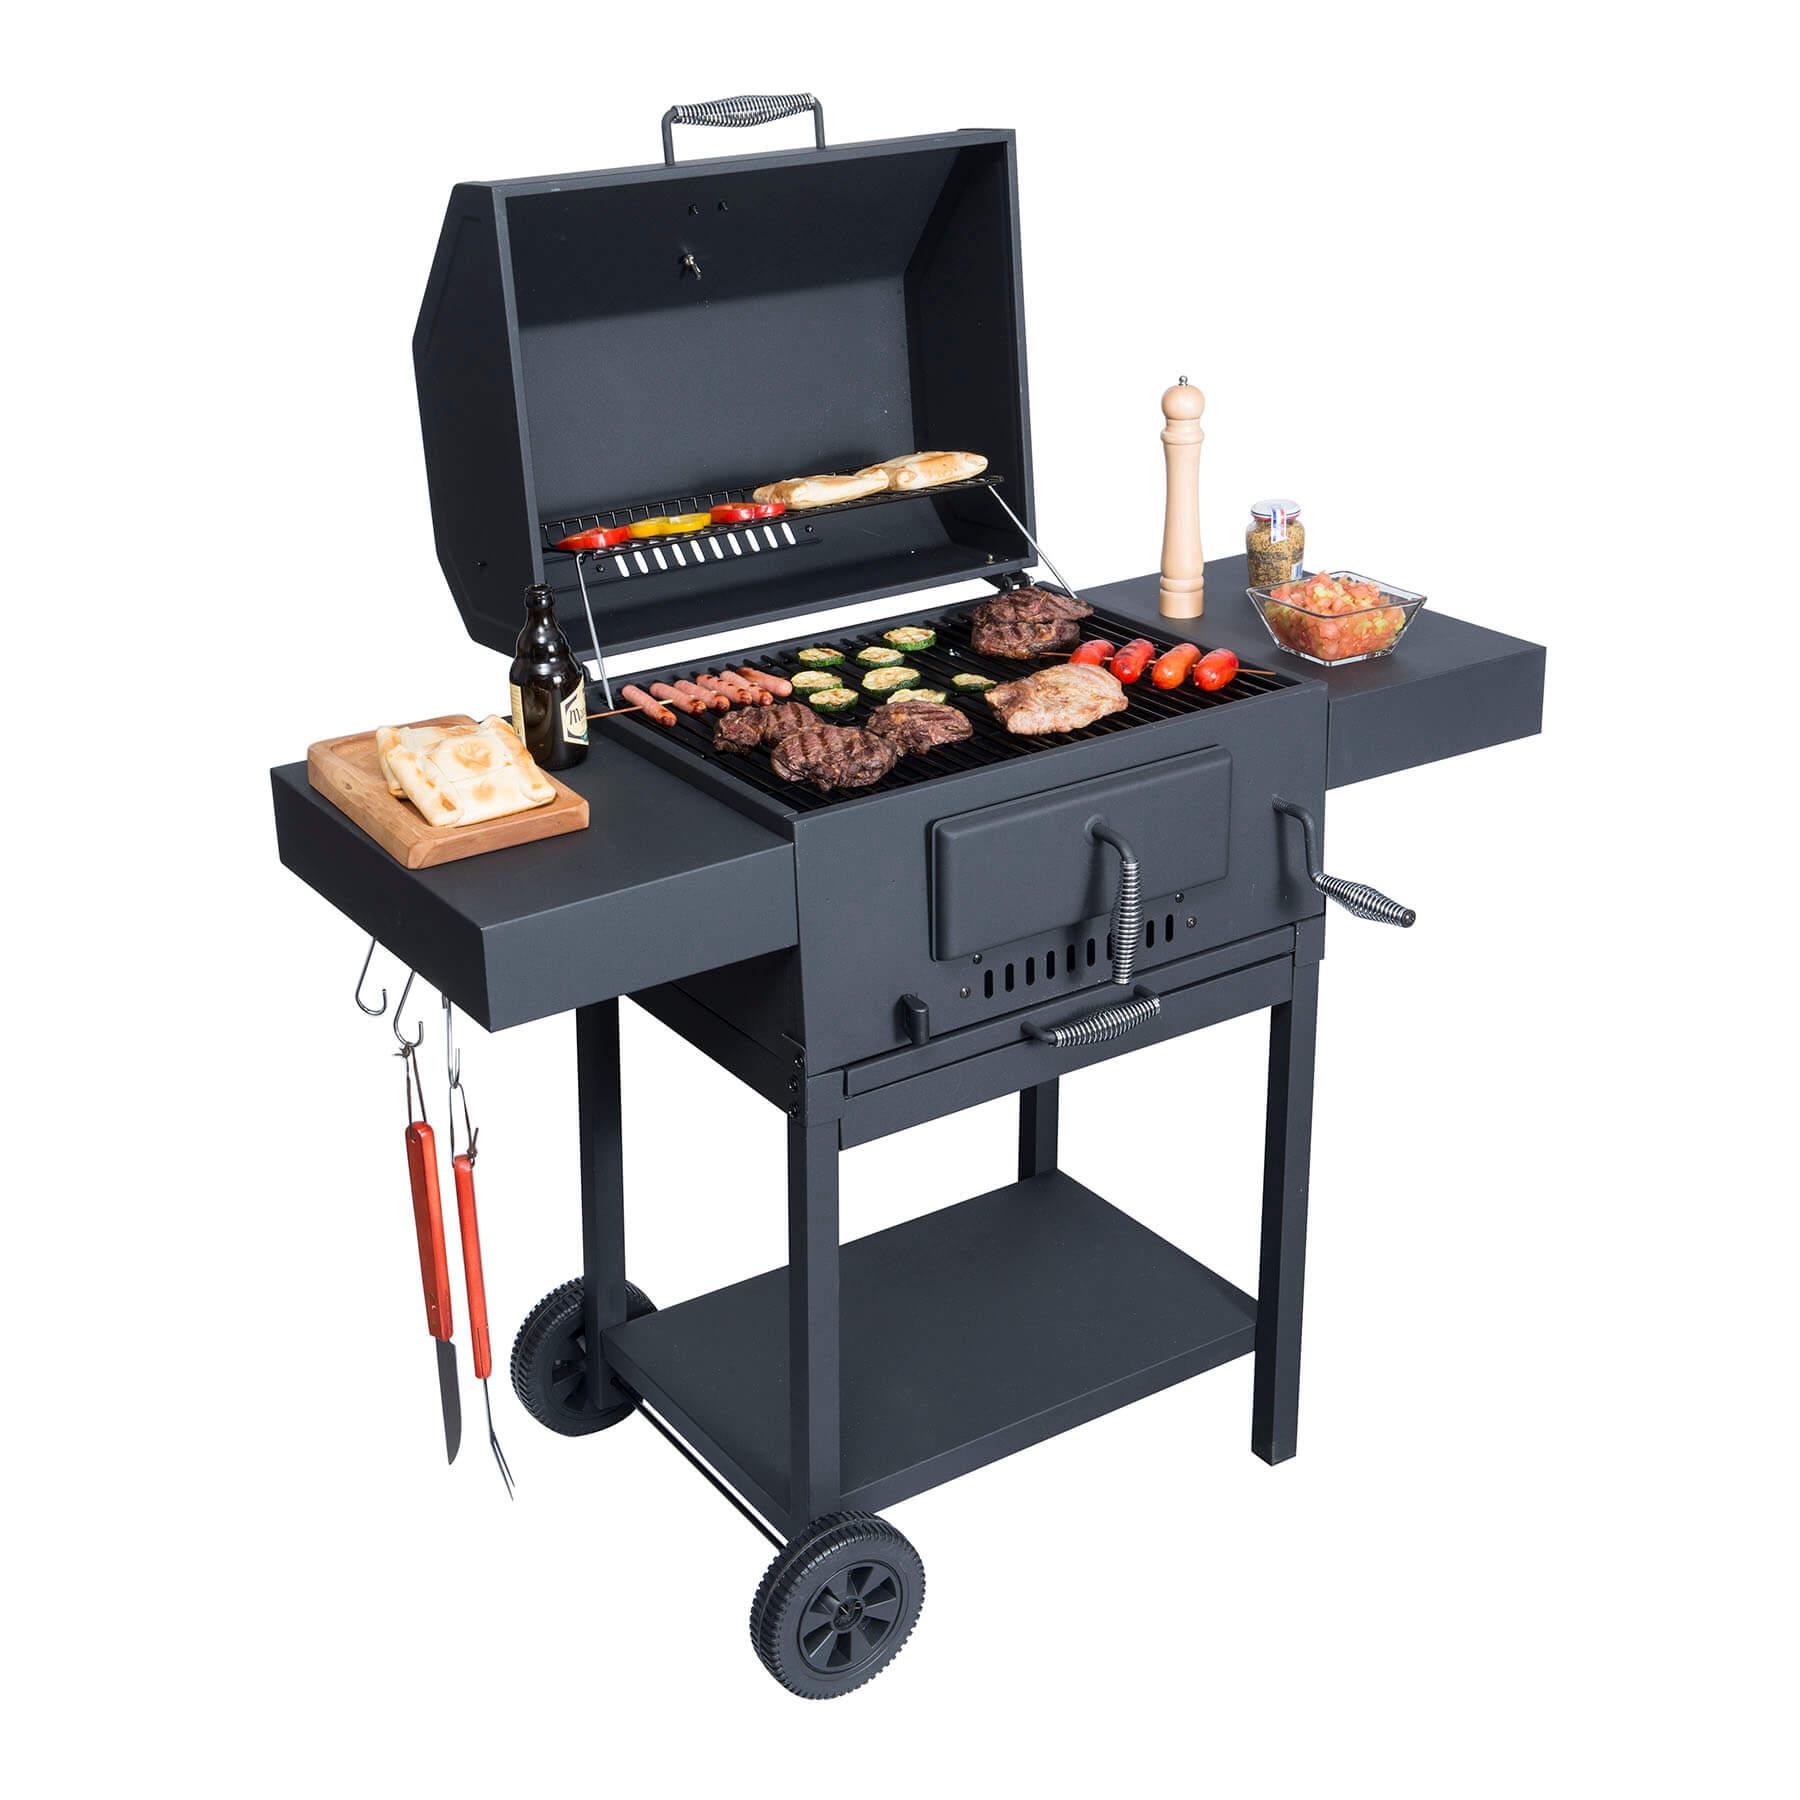 Parrilla a carb n tennessee bbq grill - Parrillas para asar carne ...